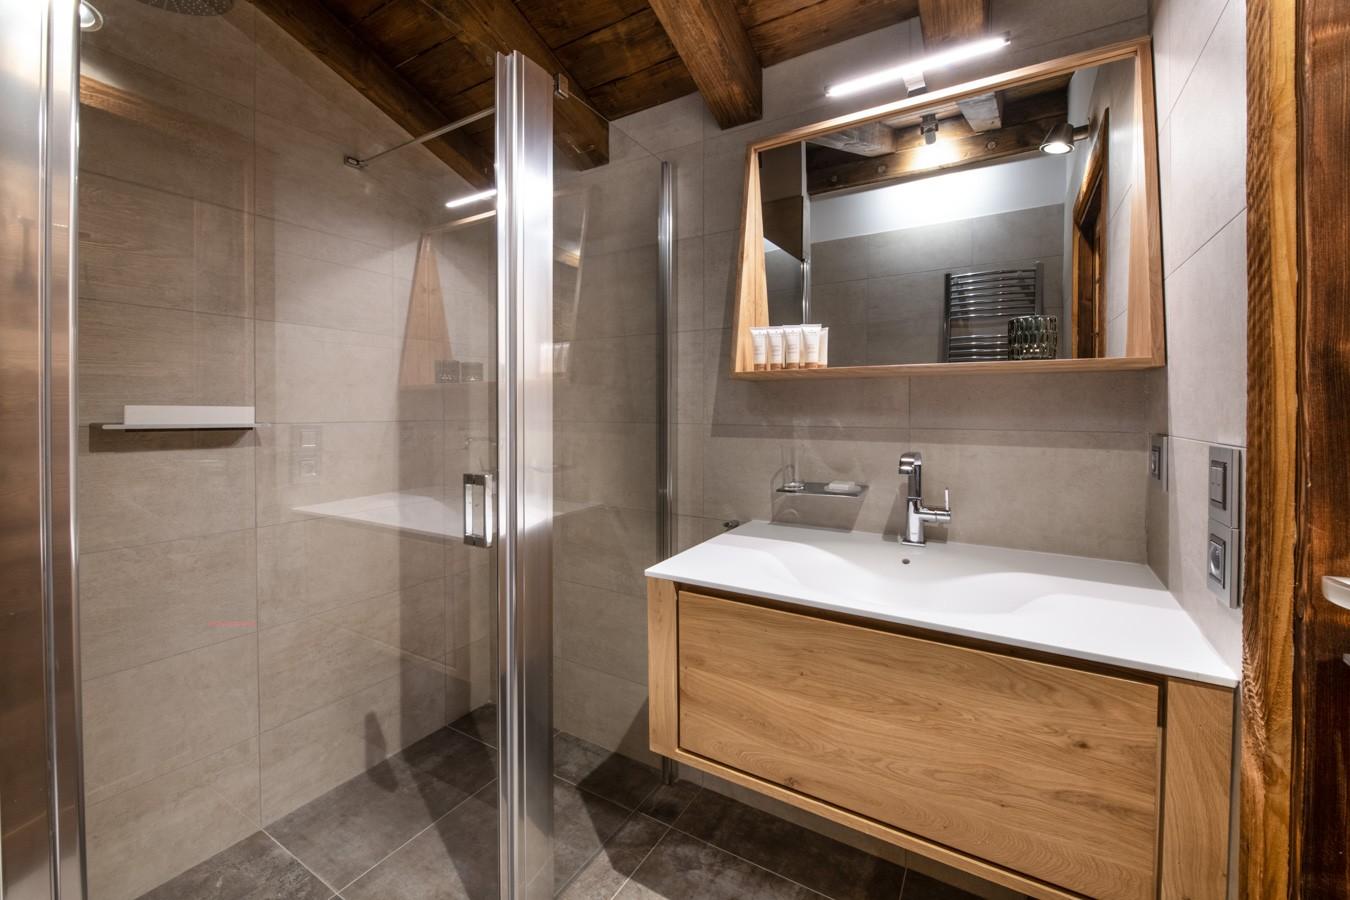 Les Gets Location Appartement Luxe Anrocha Salle De Bain 4